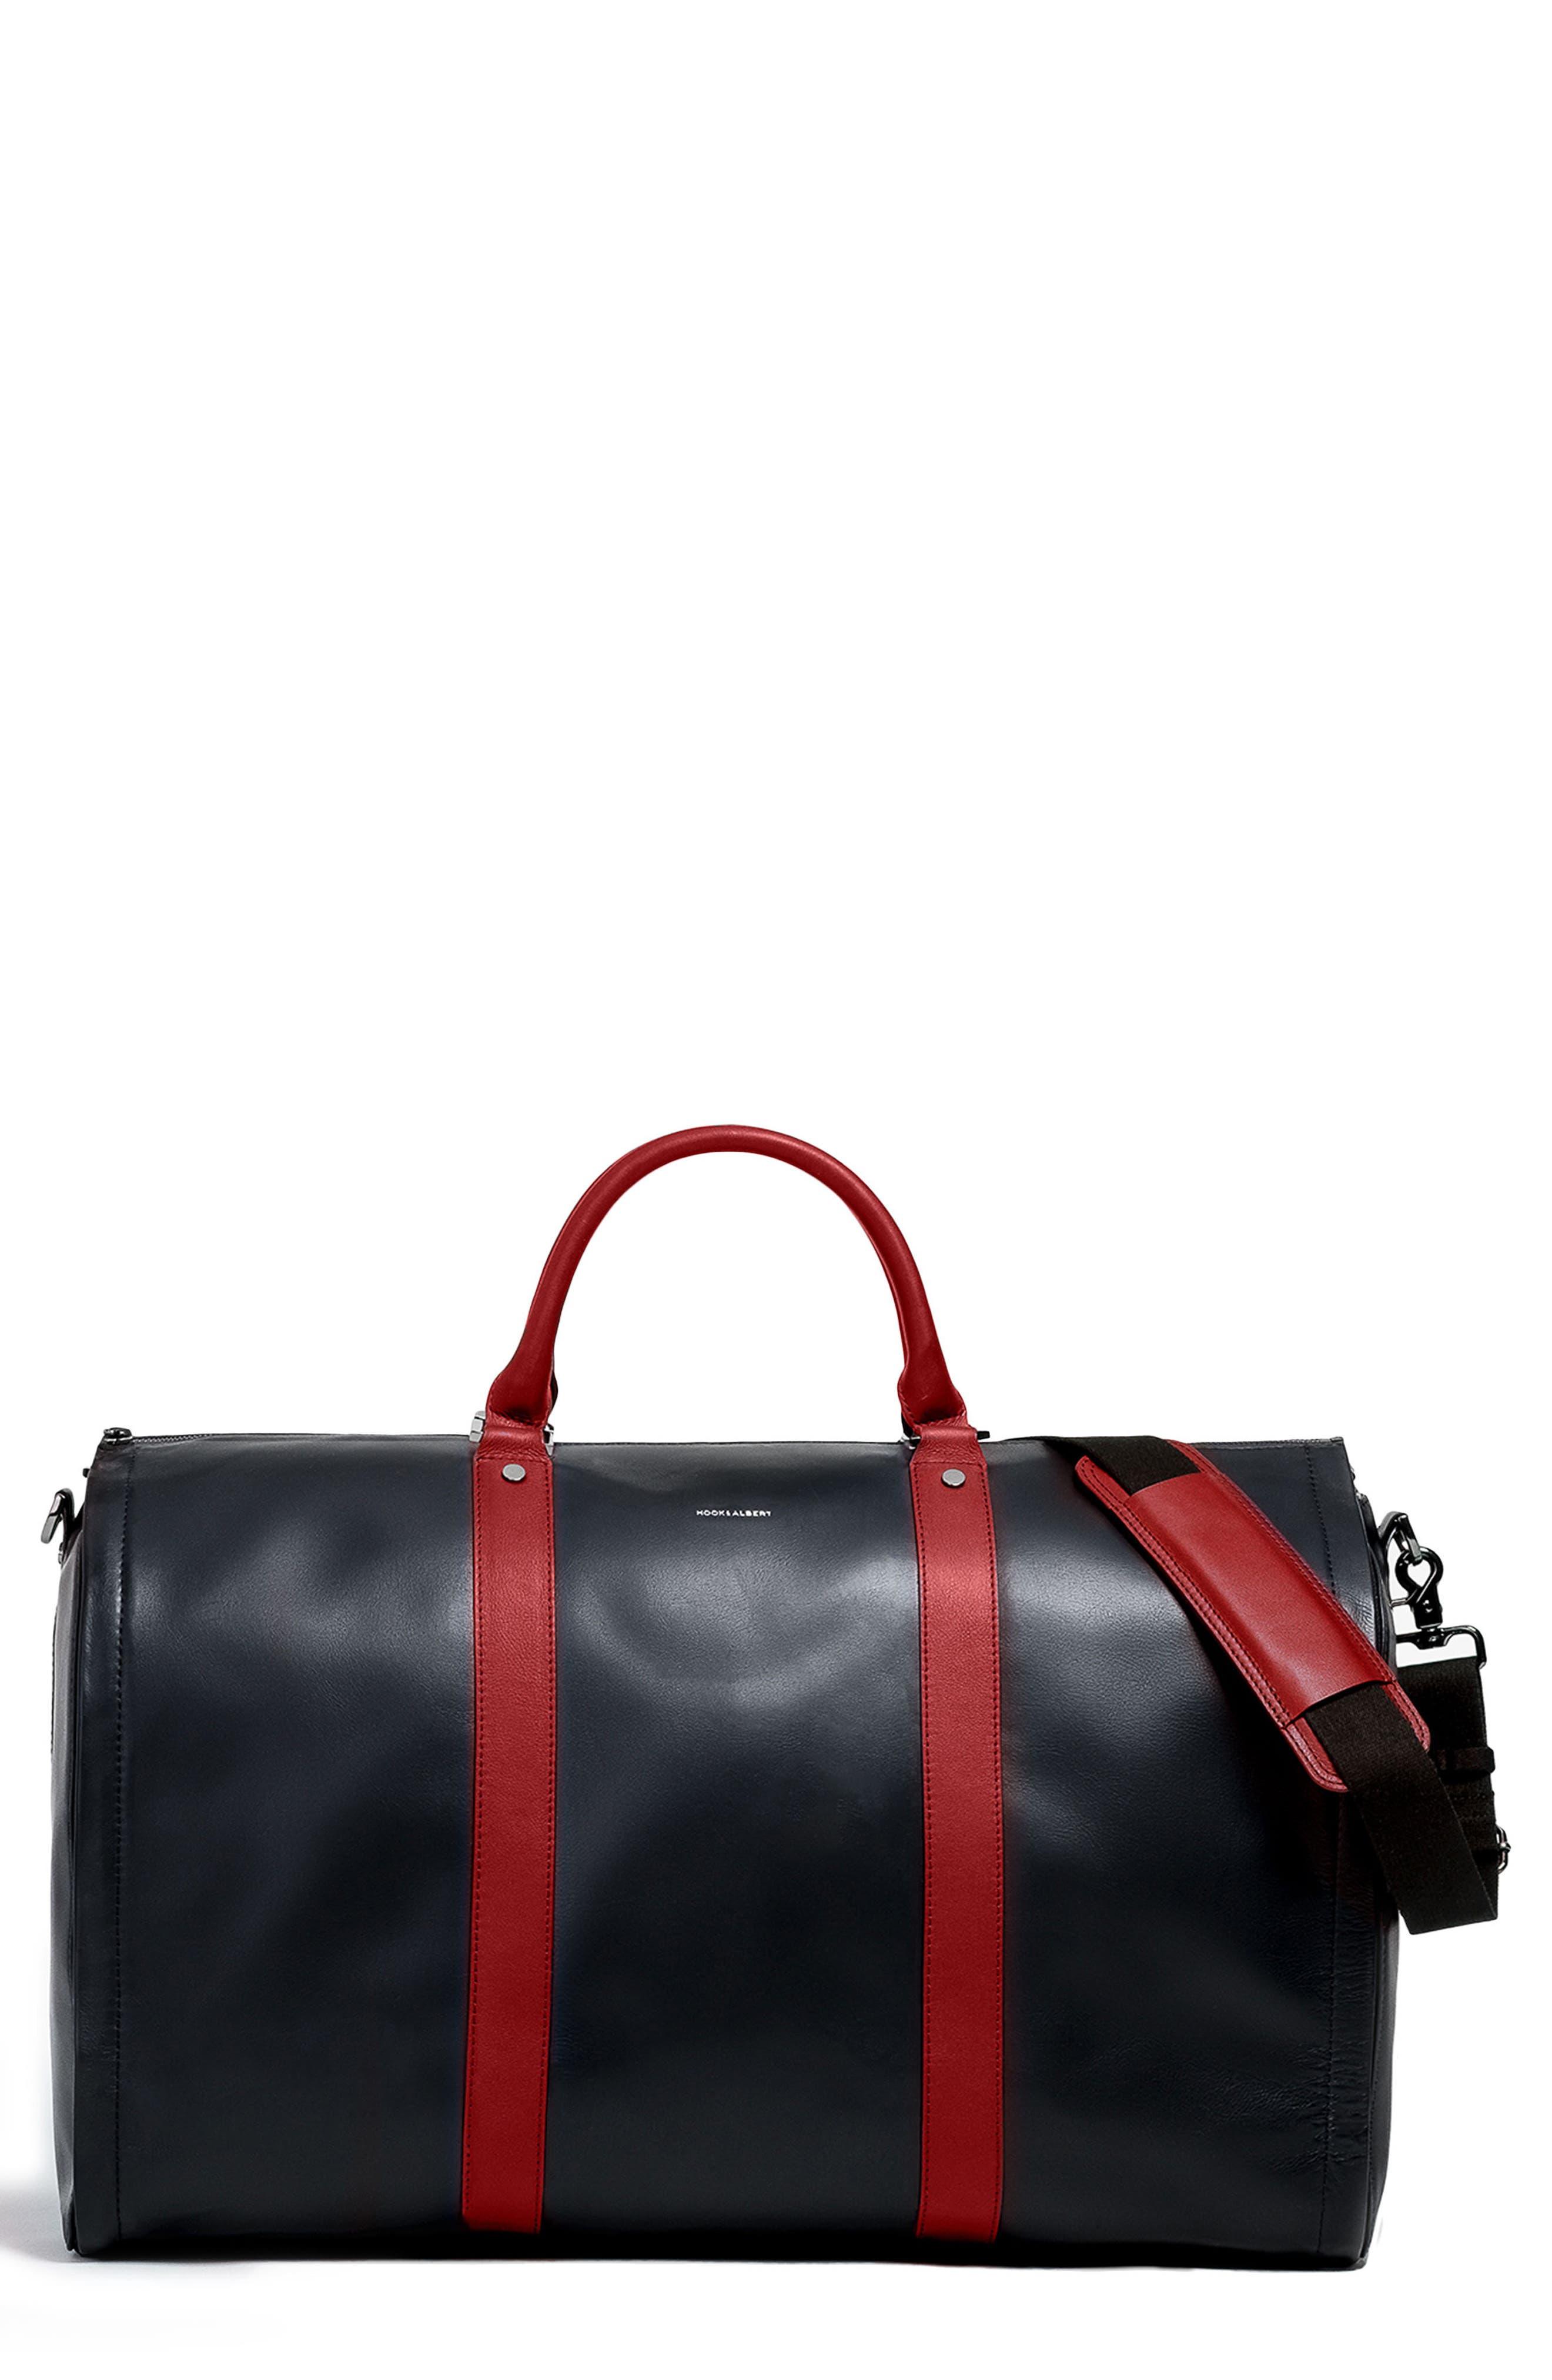 Garment Weekend Bag,                             Main thumbnail 1, color,                             Red